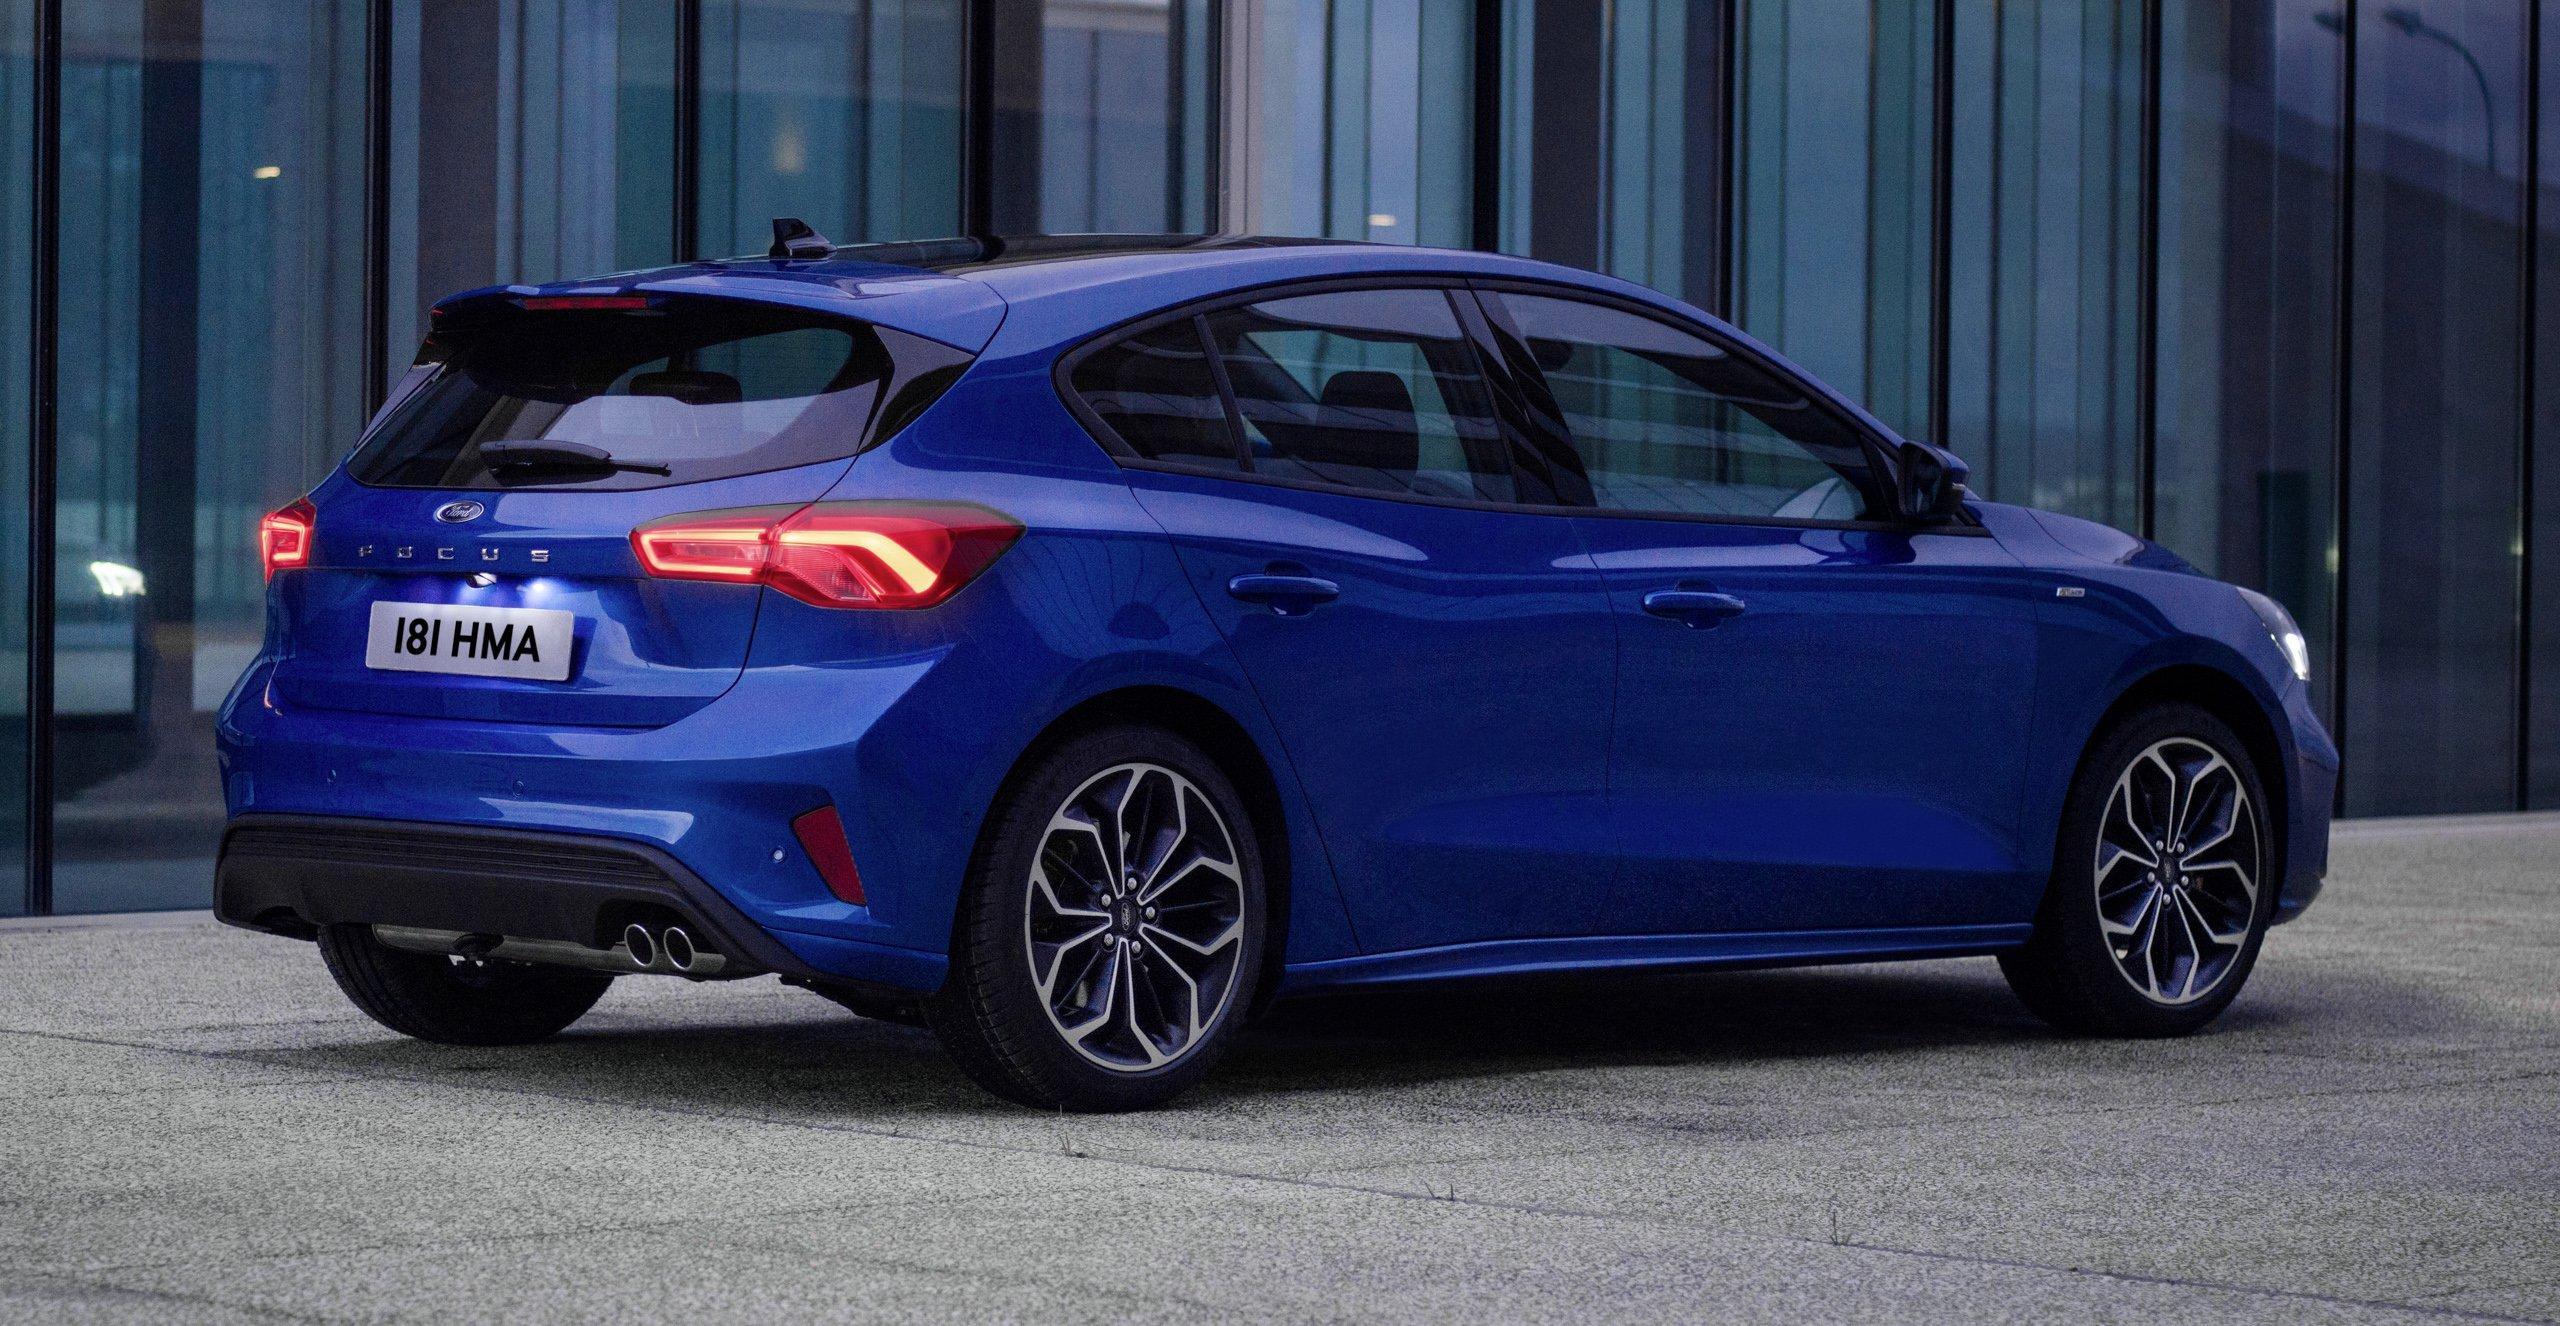 Novo Ford Focus 2018 >> Ford Focus Mk4 2019 – tiga gaya badan, enam varian, enjin EcoBoost/EcoBlue, automatik lapan ...